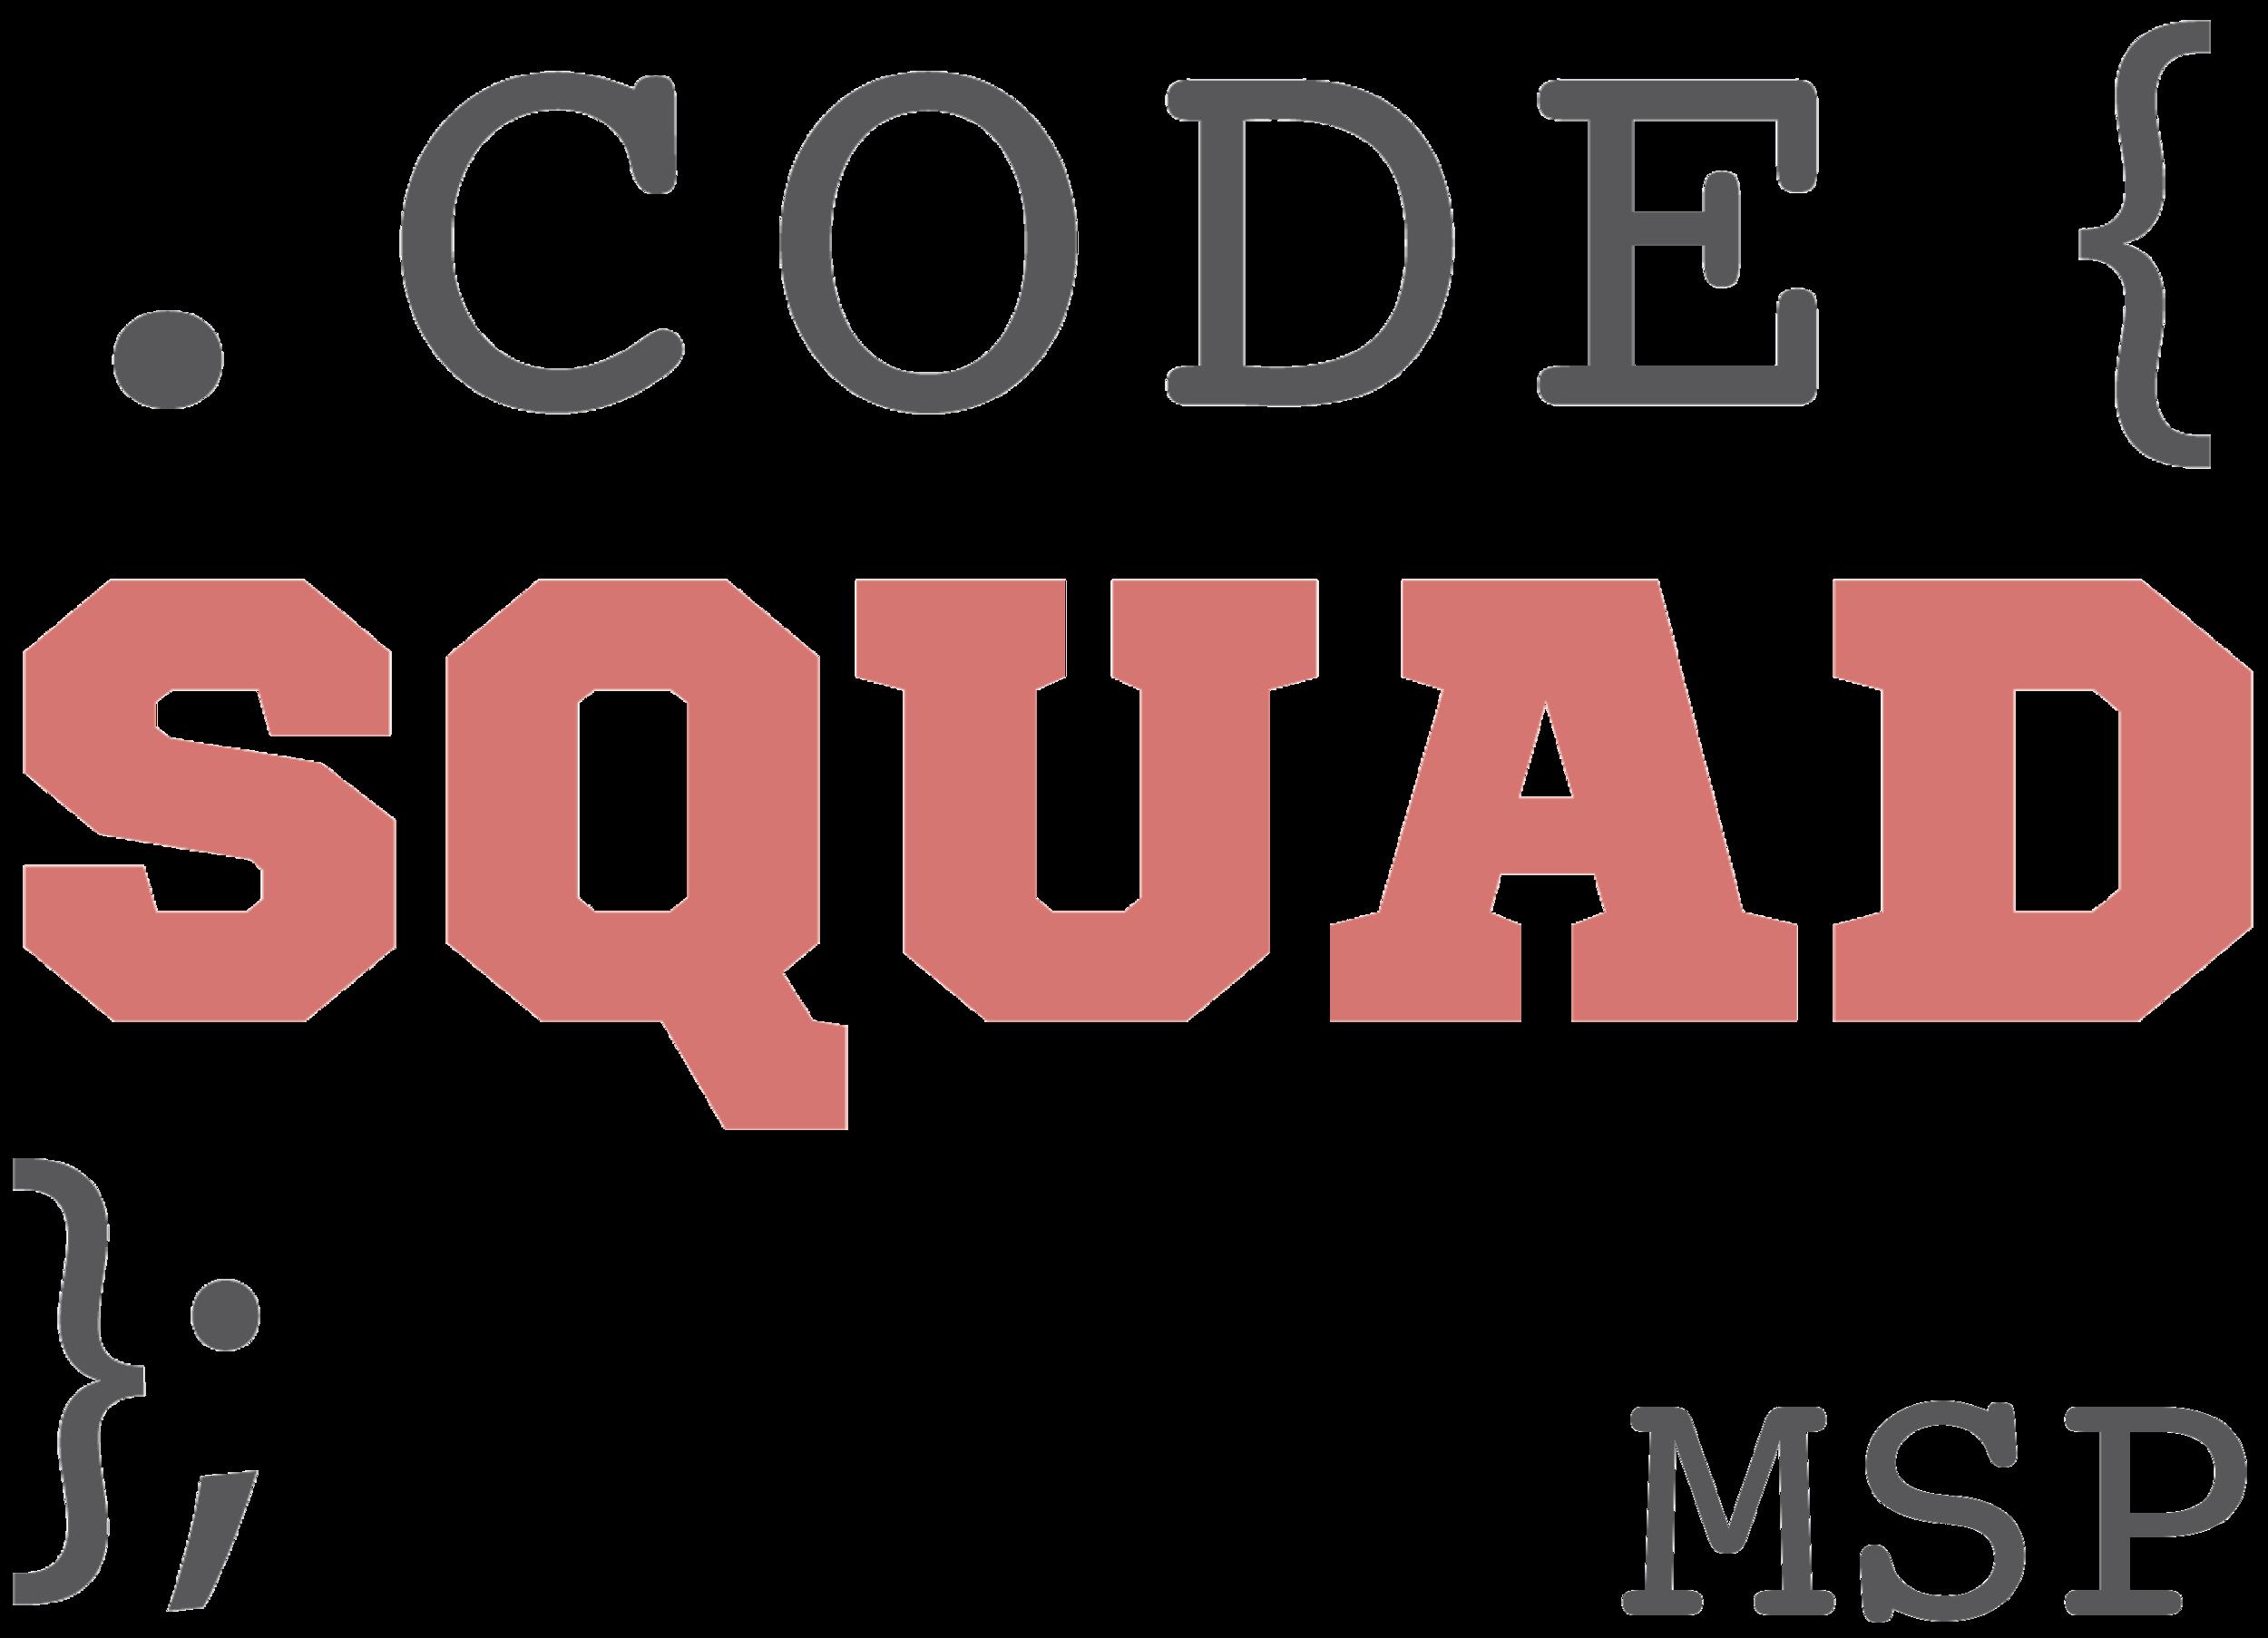 The winning Code Squad Logo designed by Harrison.